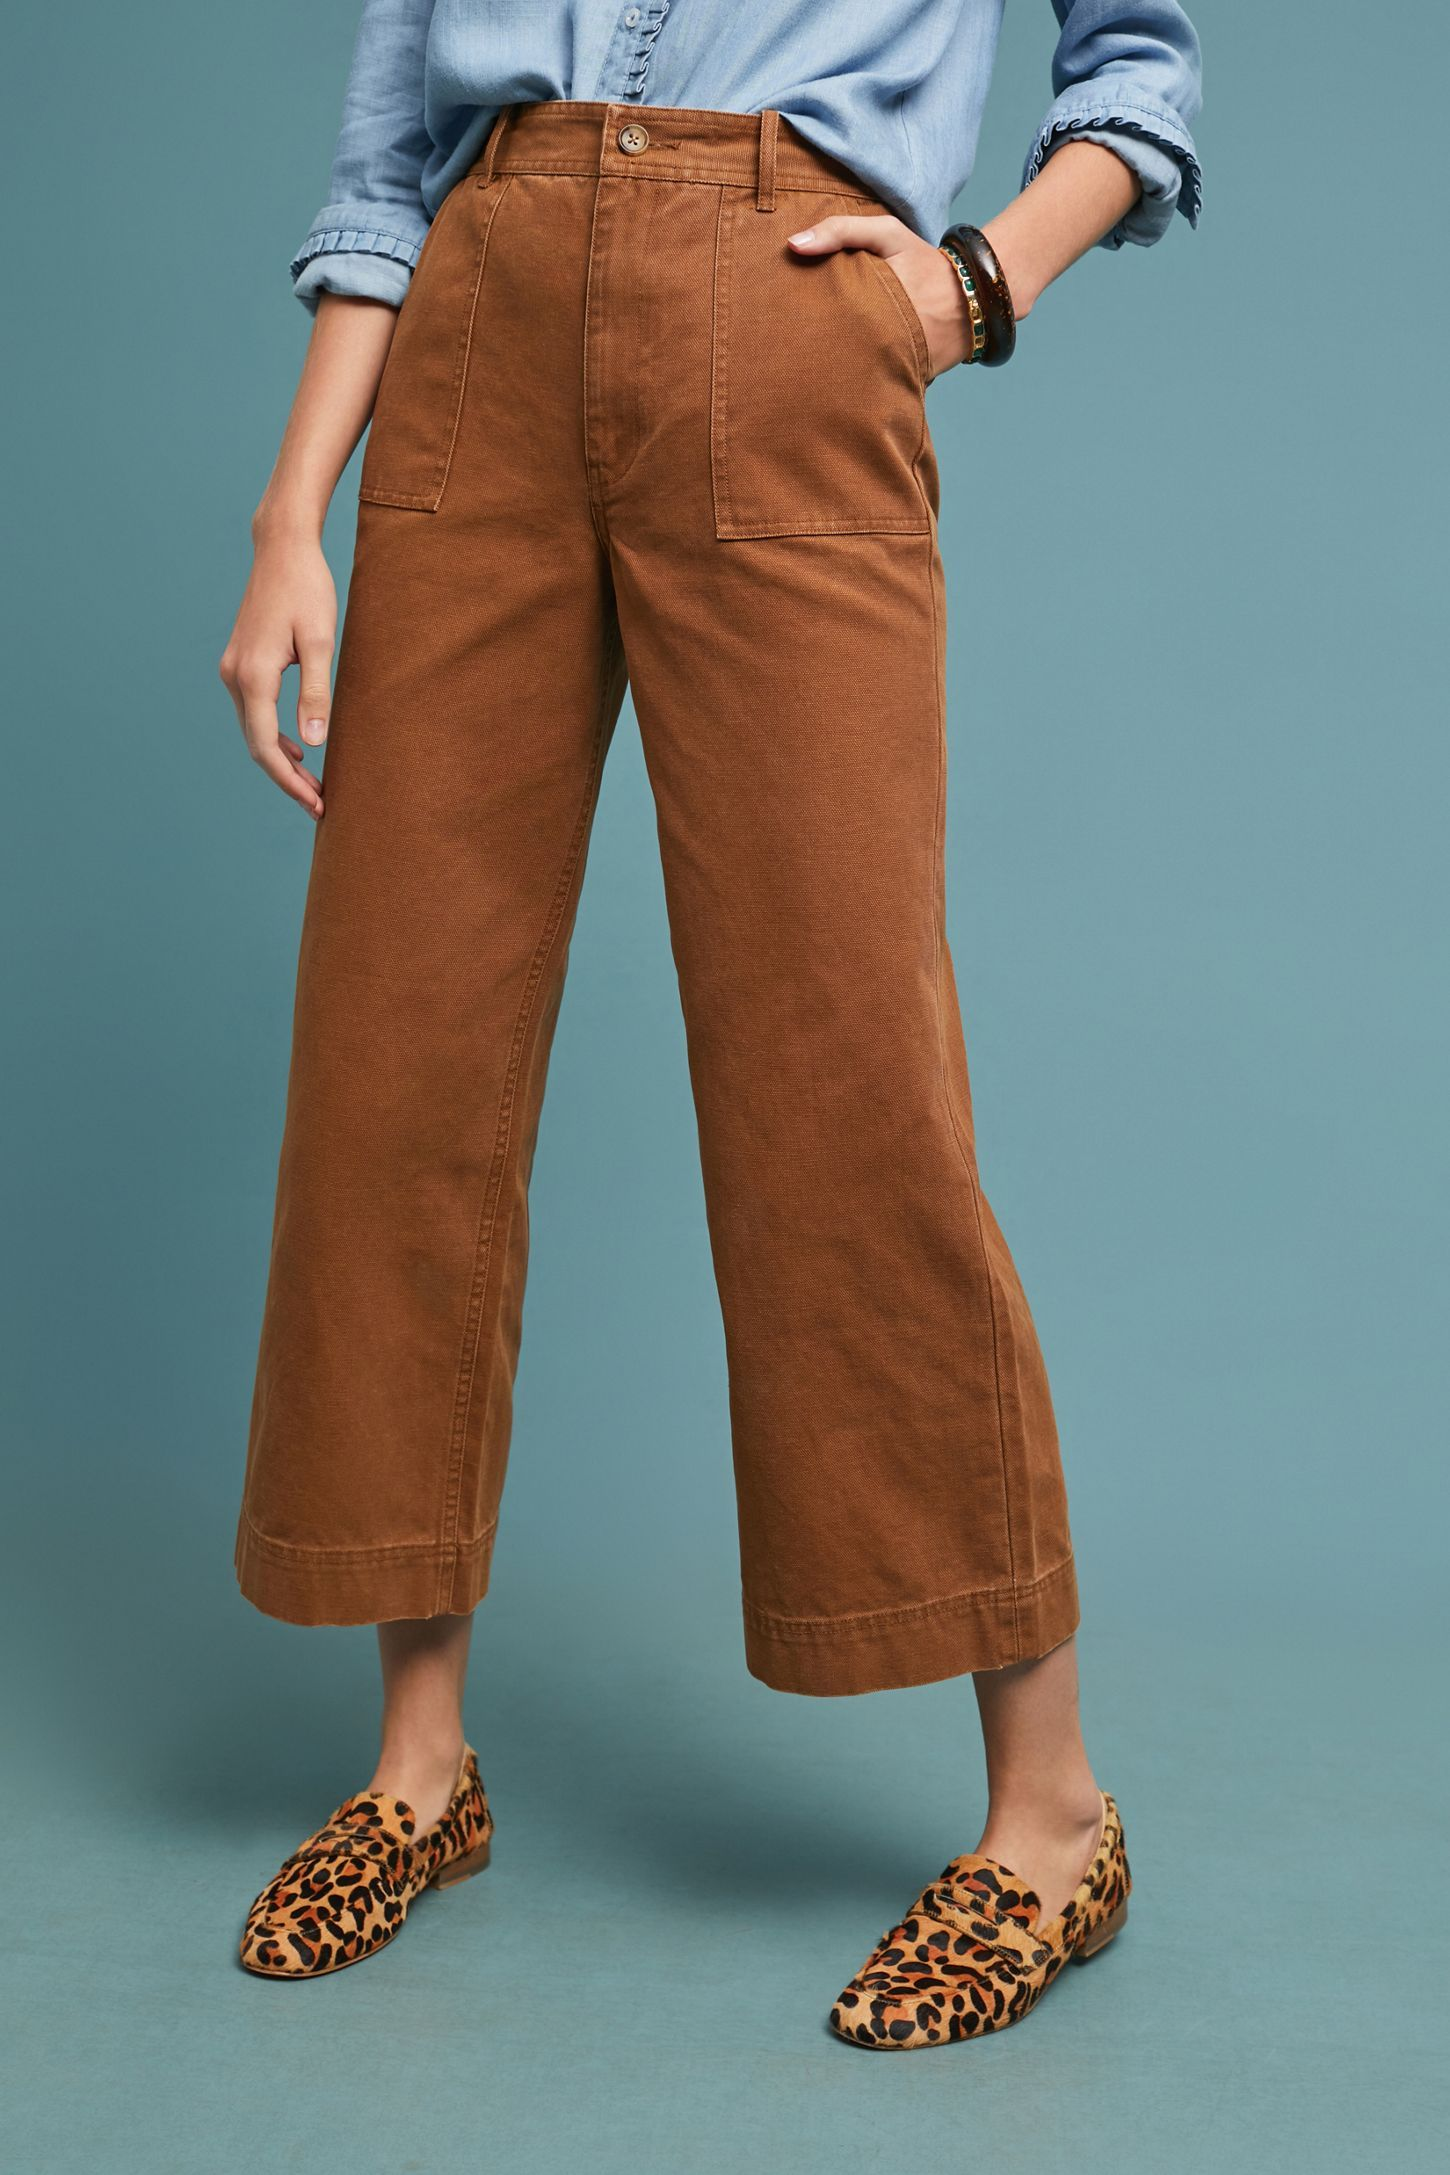 8fce26753b2c Slide View  3  Frye Nadia High-Rise Wide-Leg Jeans